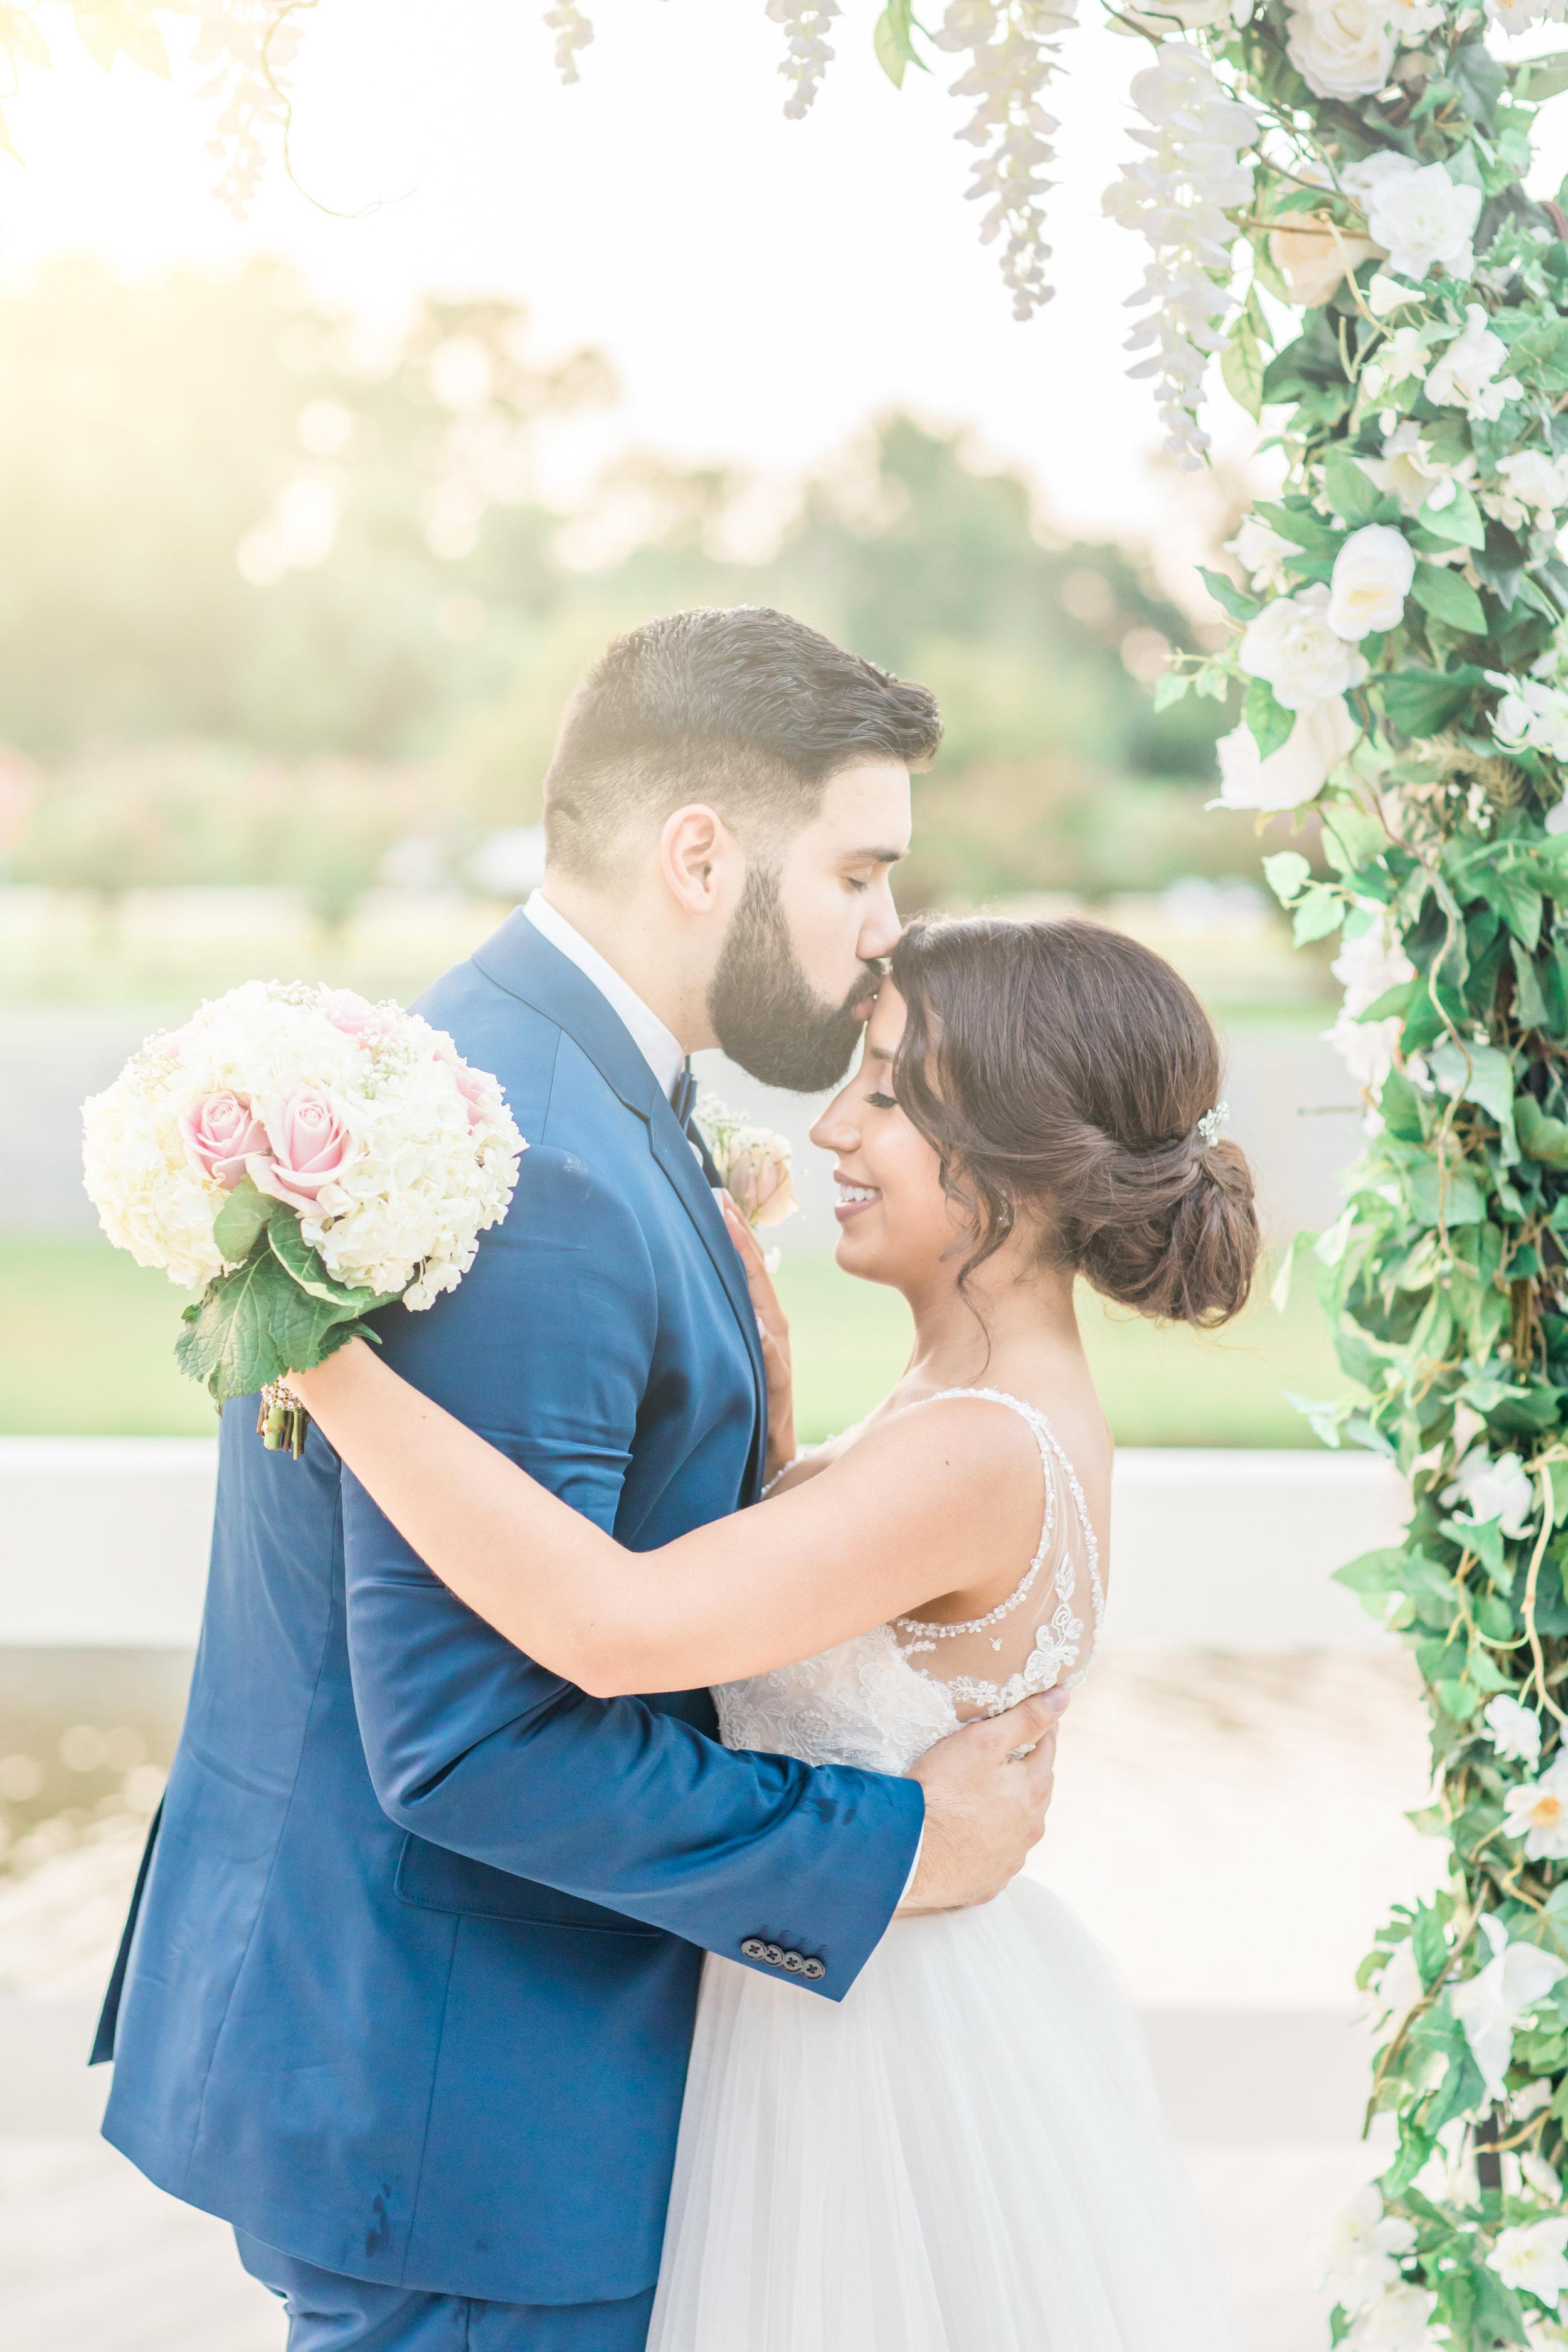 20170805-Wedding-Caro-and-Sergio-467.jpg